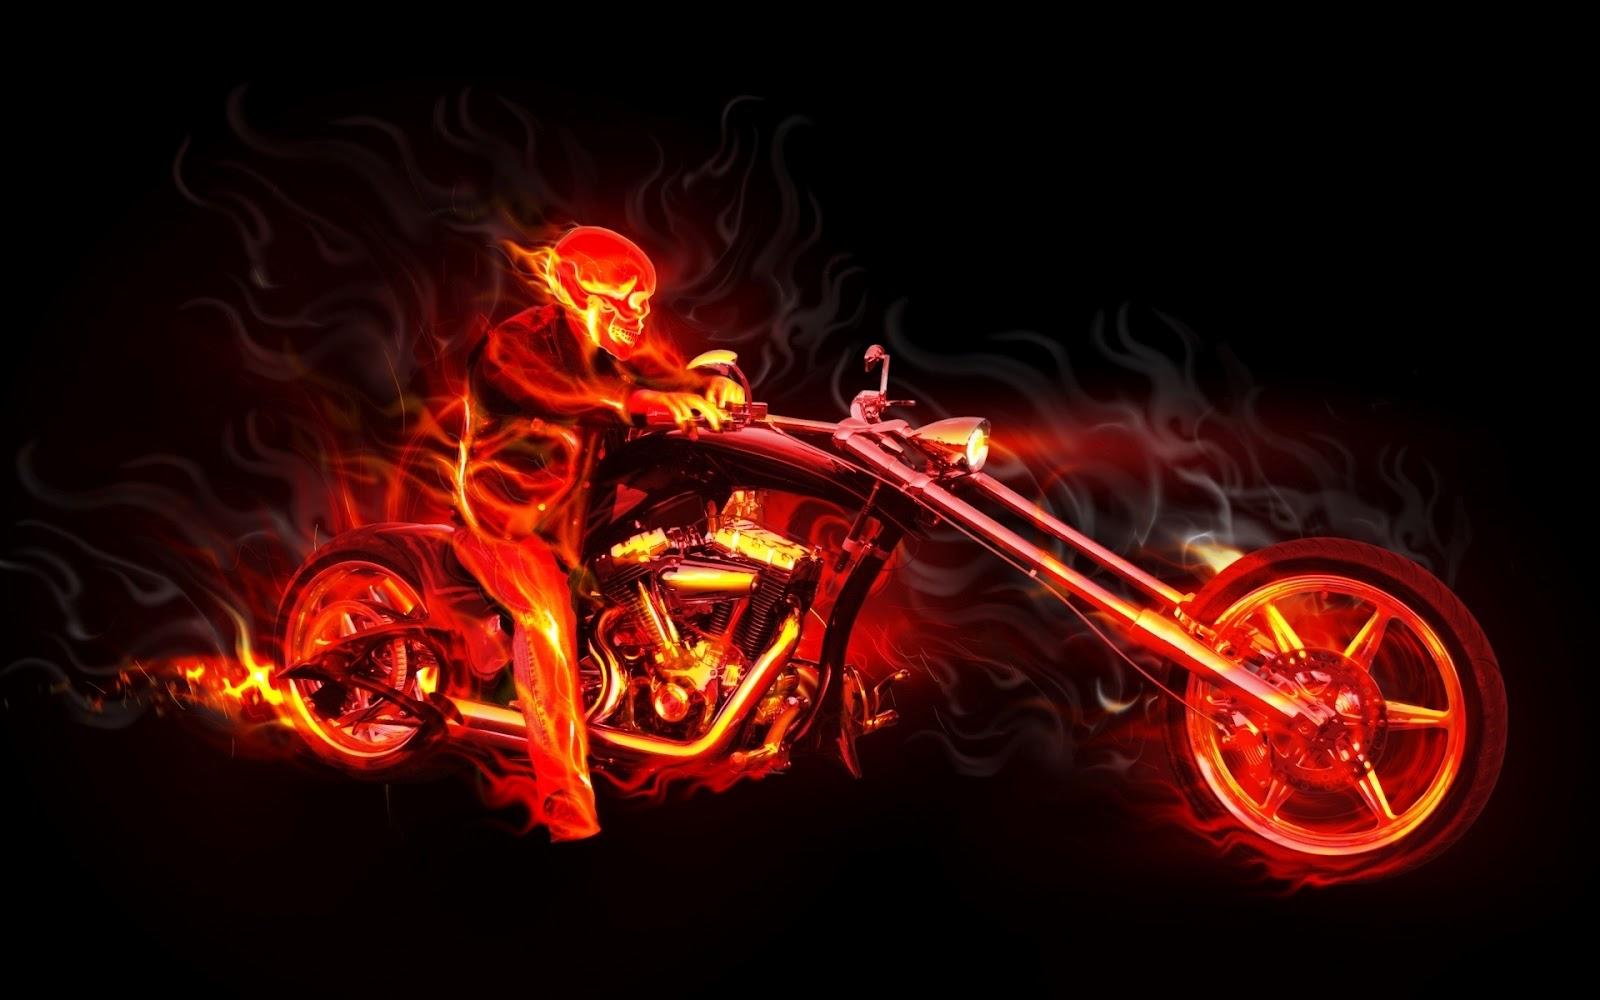 Beste kostenlose biker-dating-sites